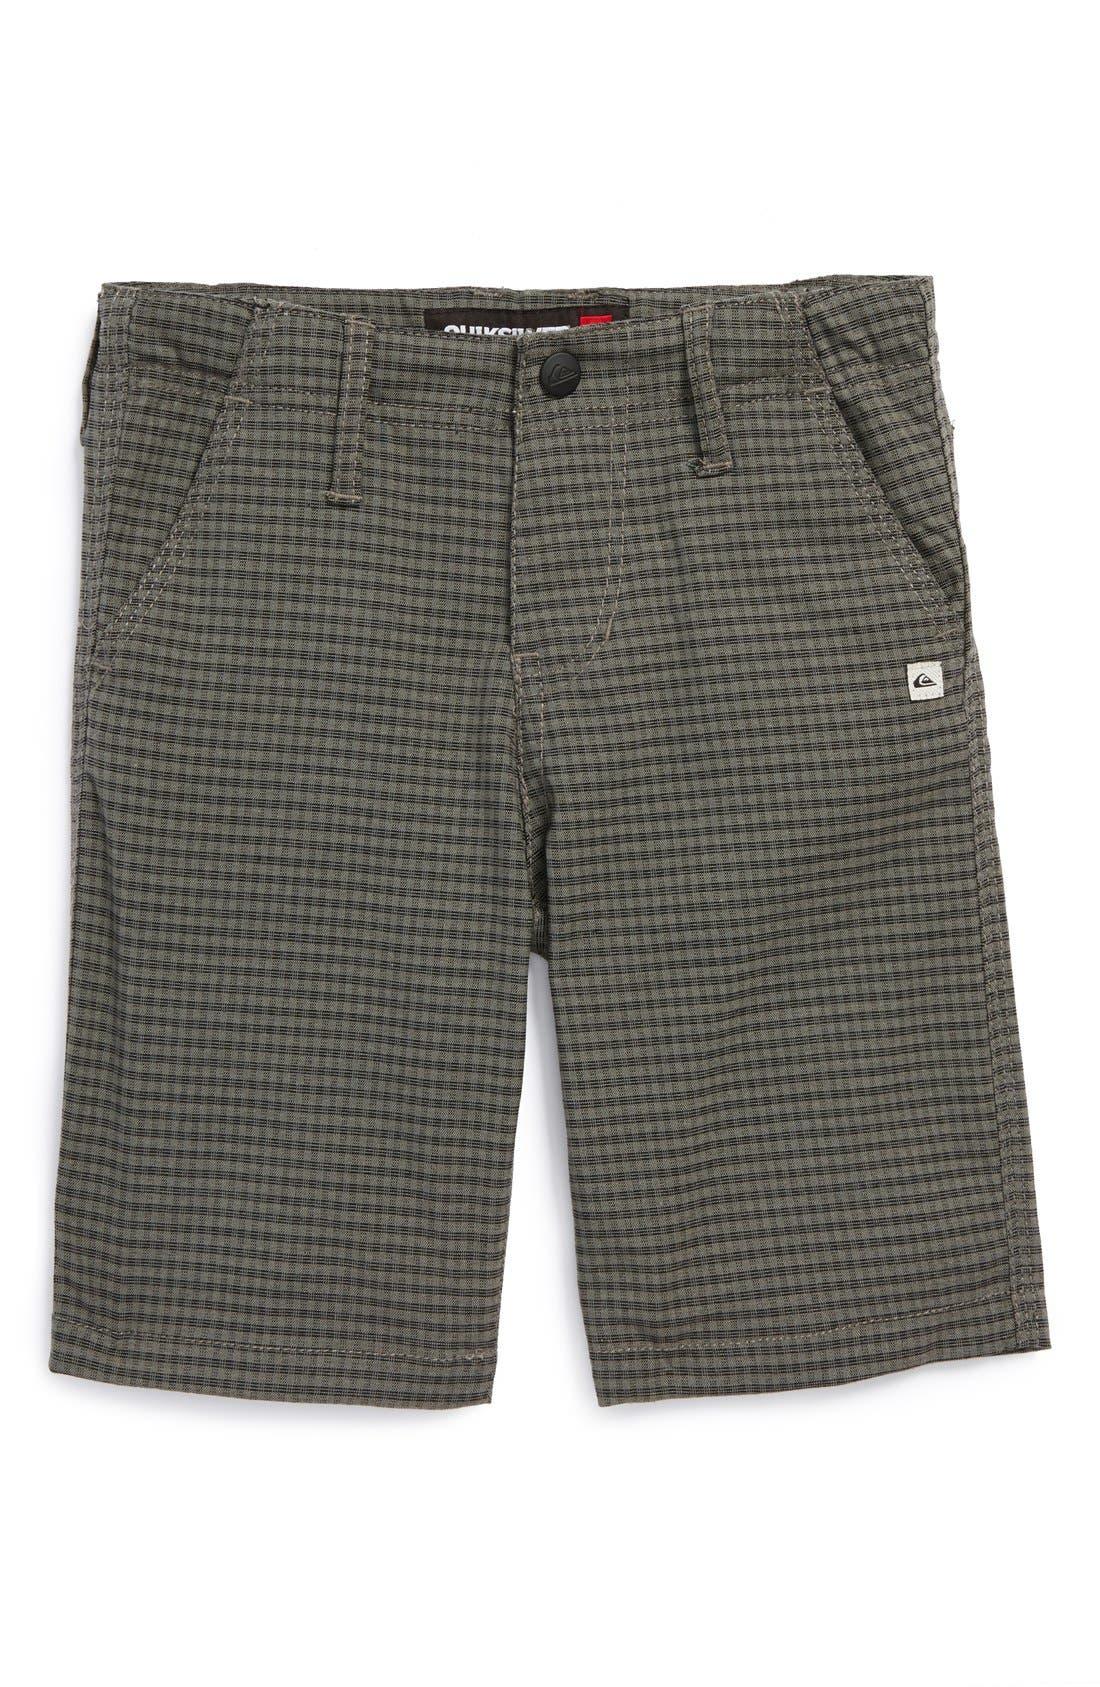 Main Image - Quiksilver 'Stamp It' Shorts (Toddler Boys)